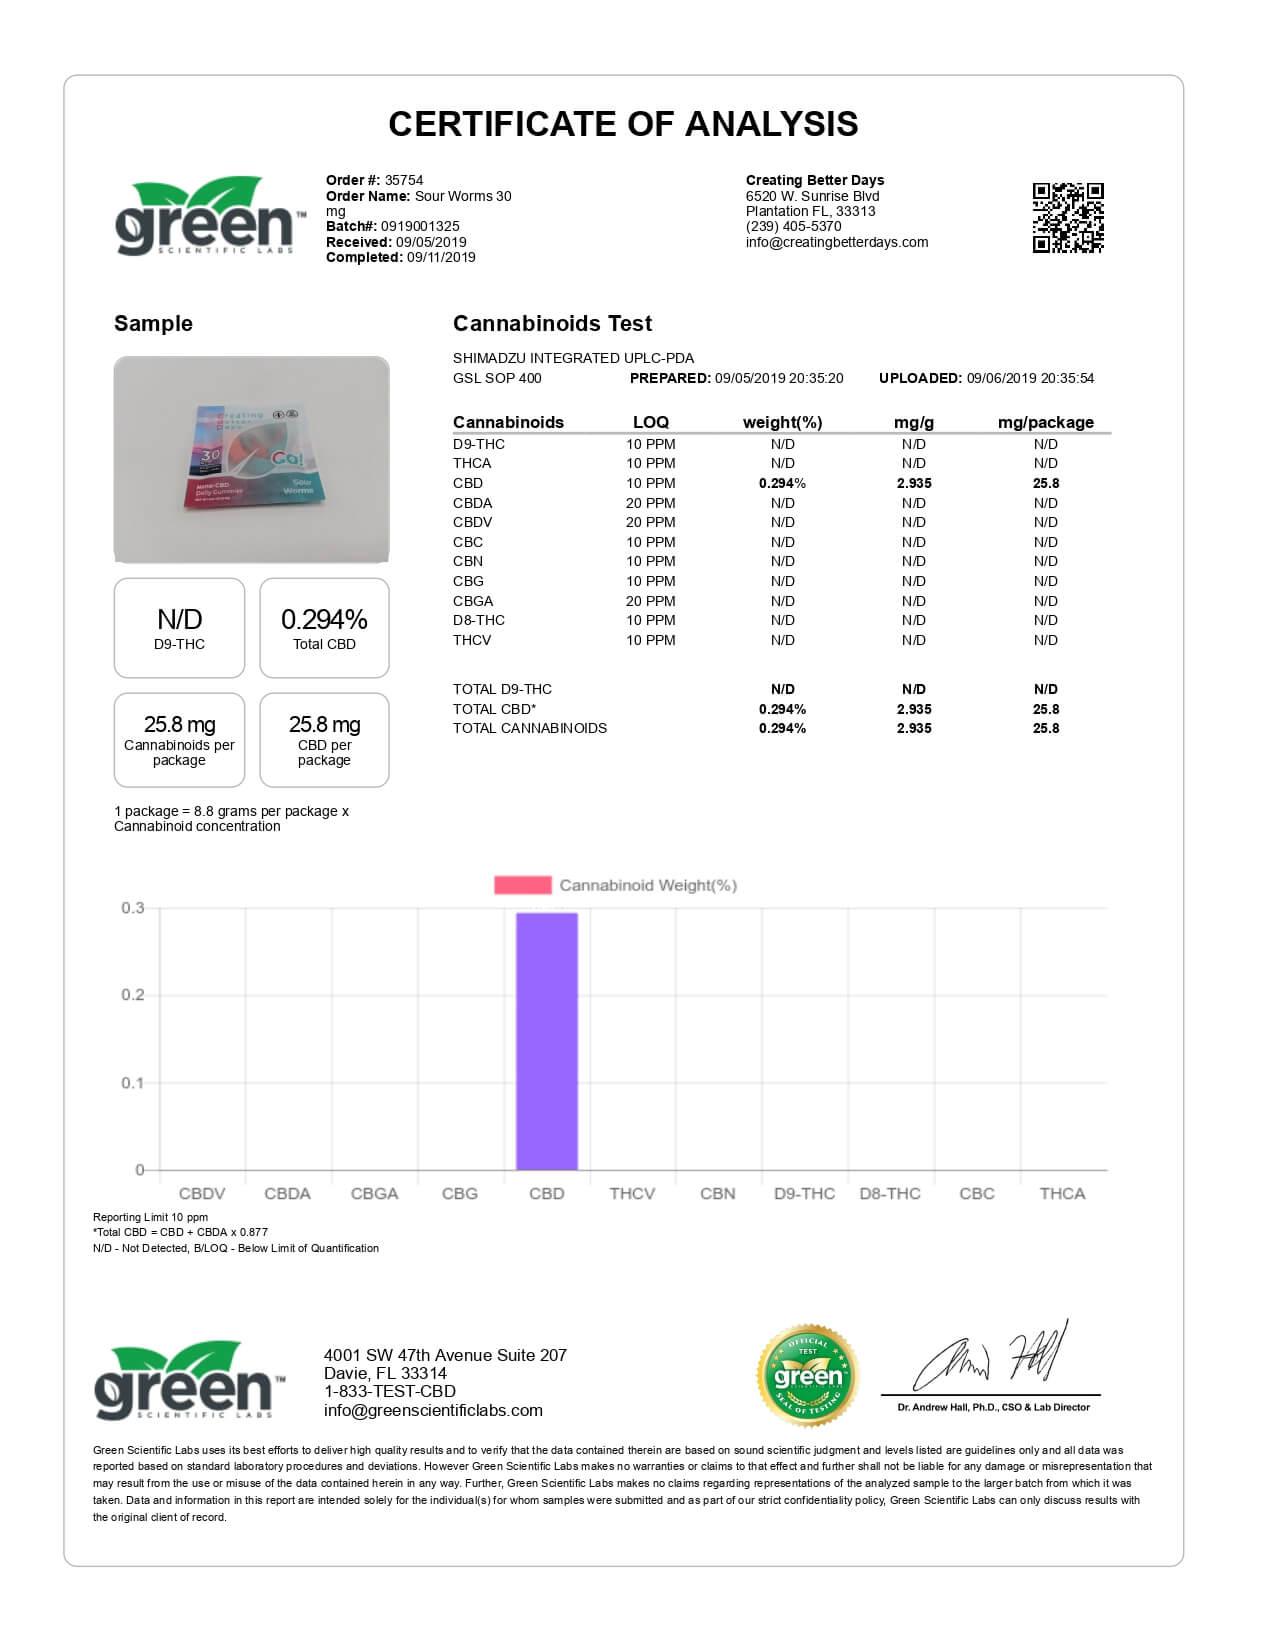 Creating Better Days CBD Edible Go! Nano-CBD Sour Worms Lab Report